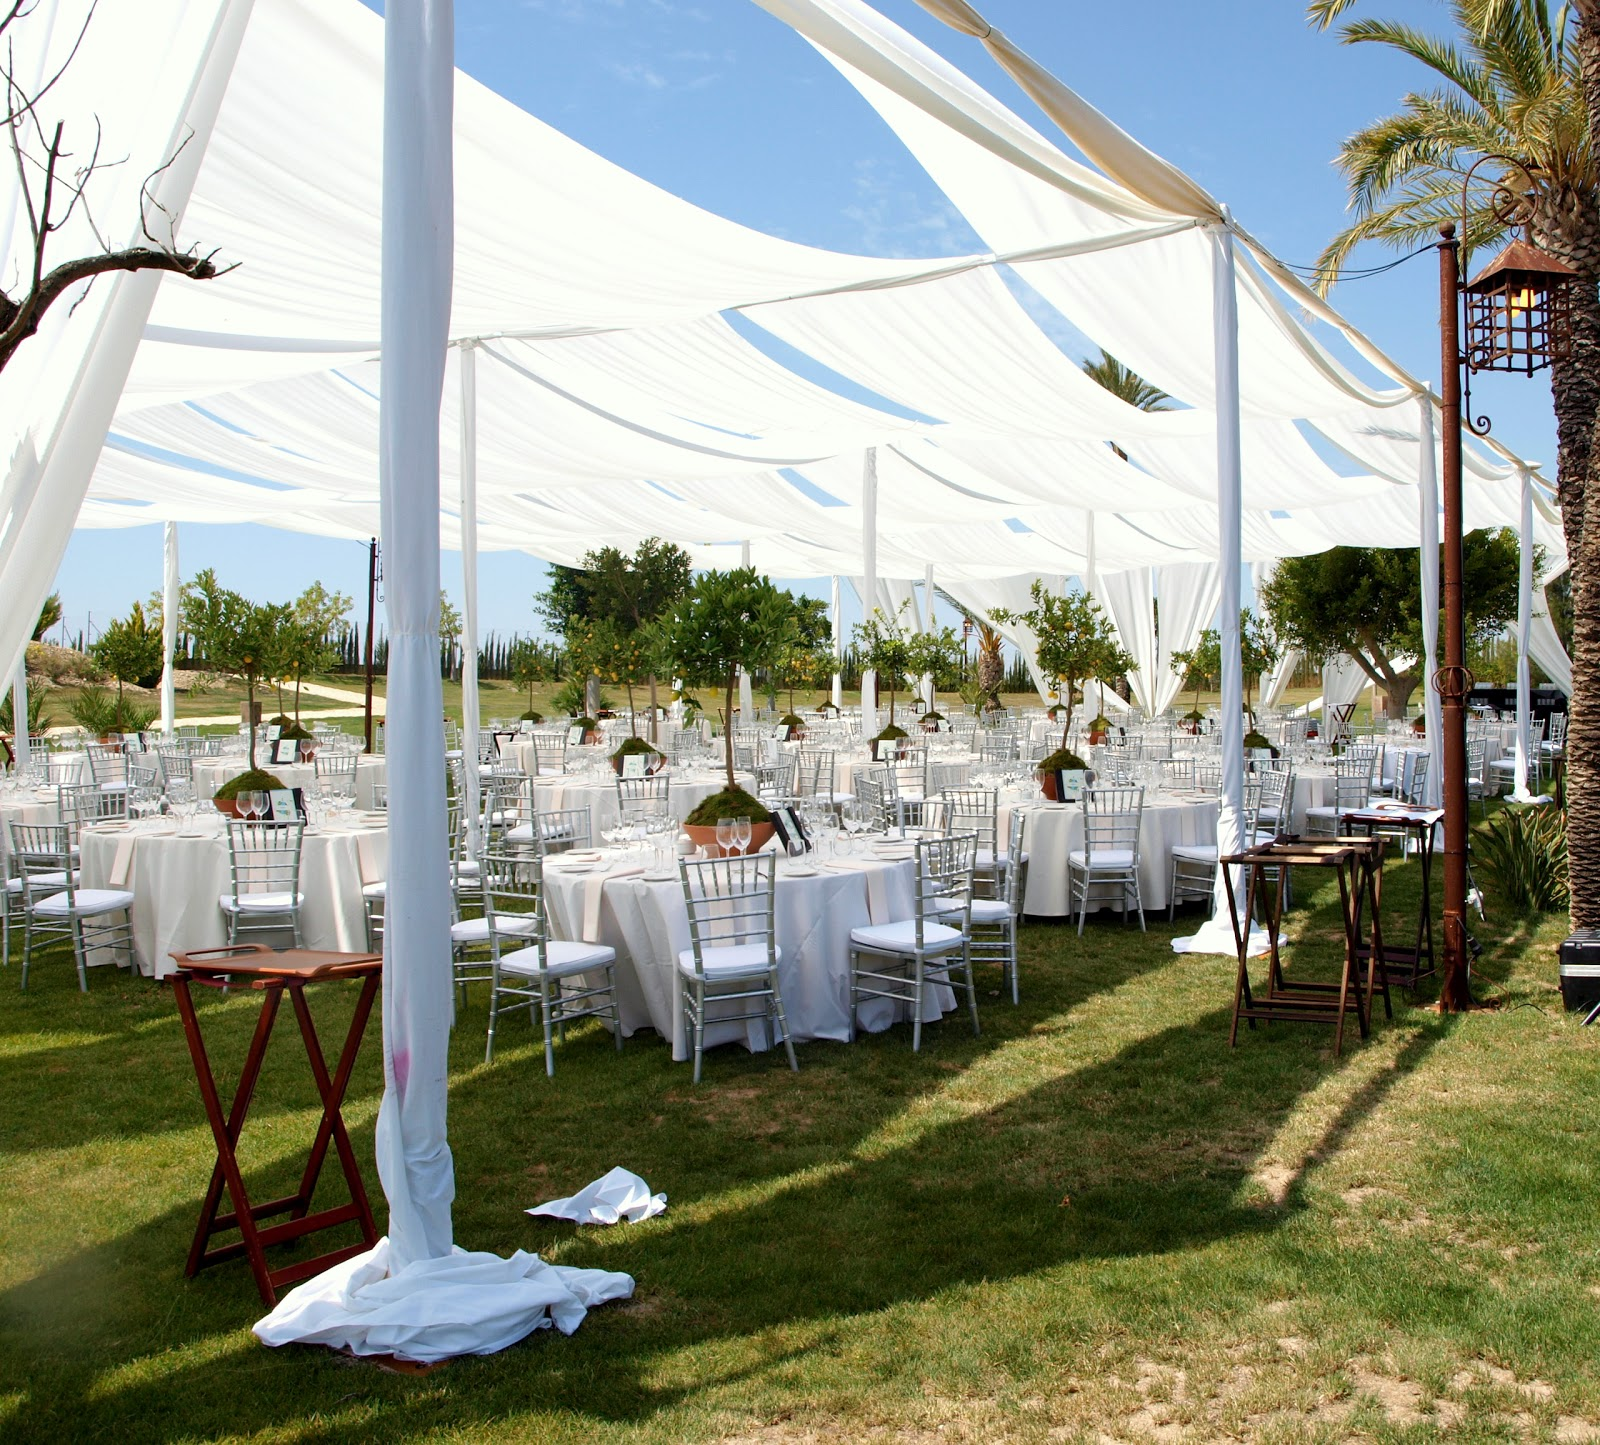 Valisse una soluci n diferente para tu evento al aire for Tela geotextil para jardines